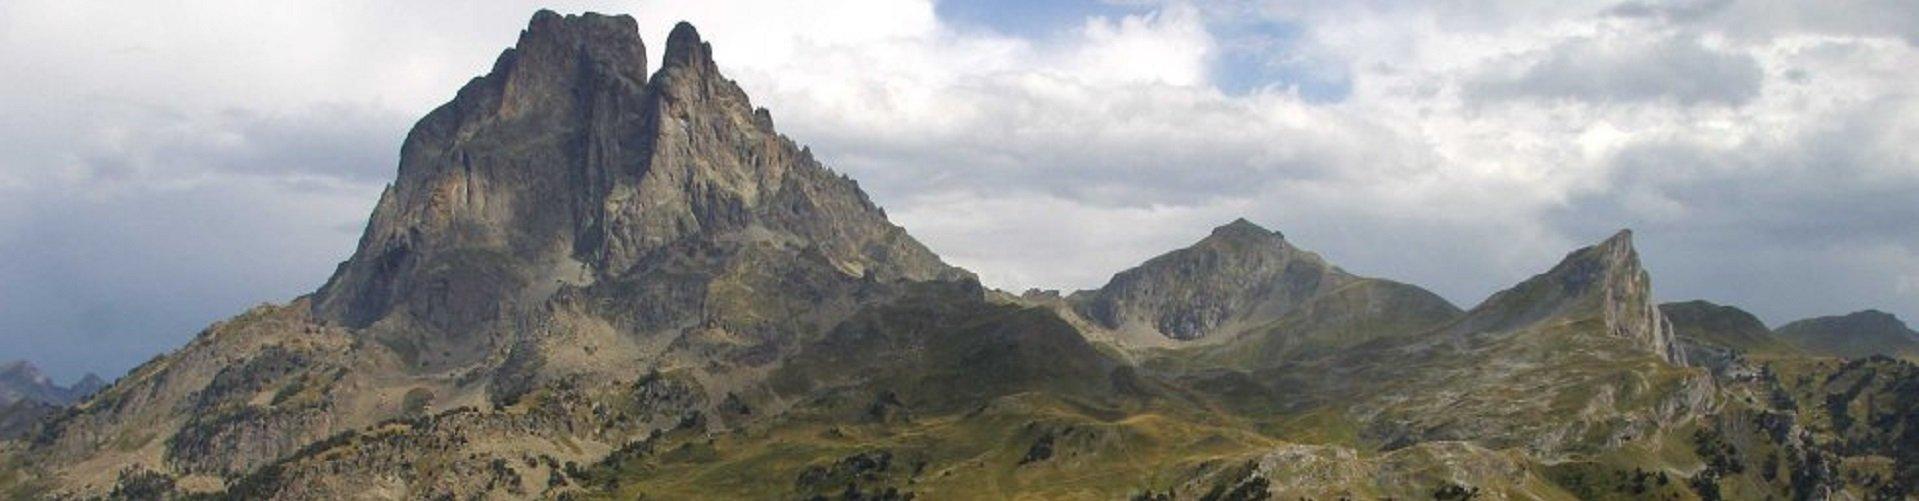 Banner foto Midi-Pyreneeën